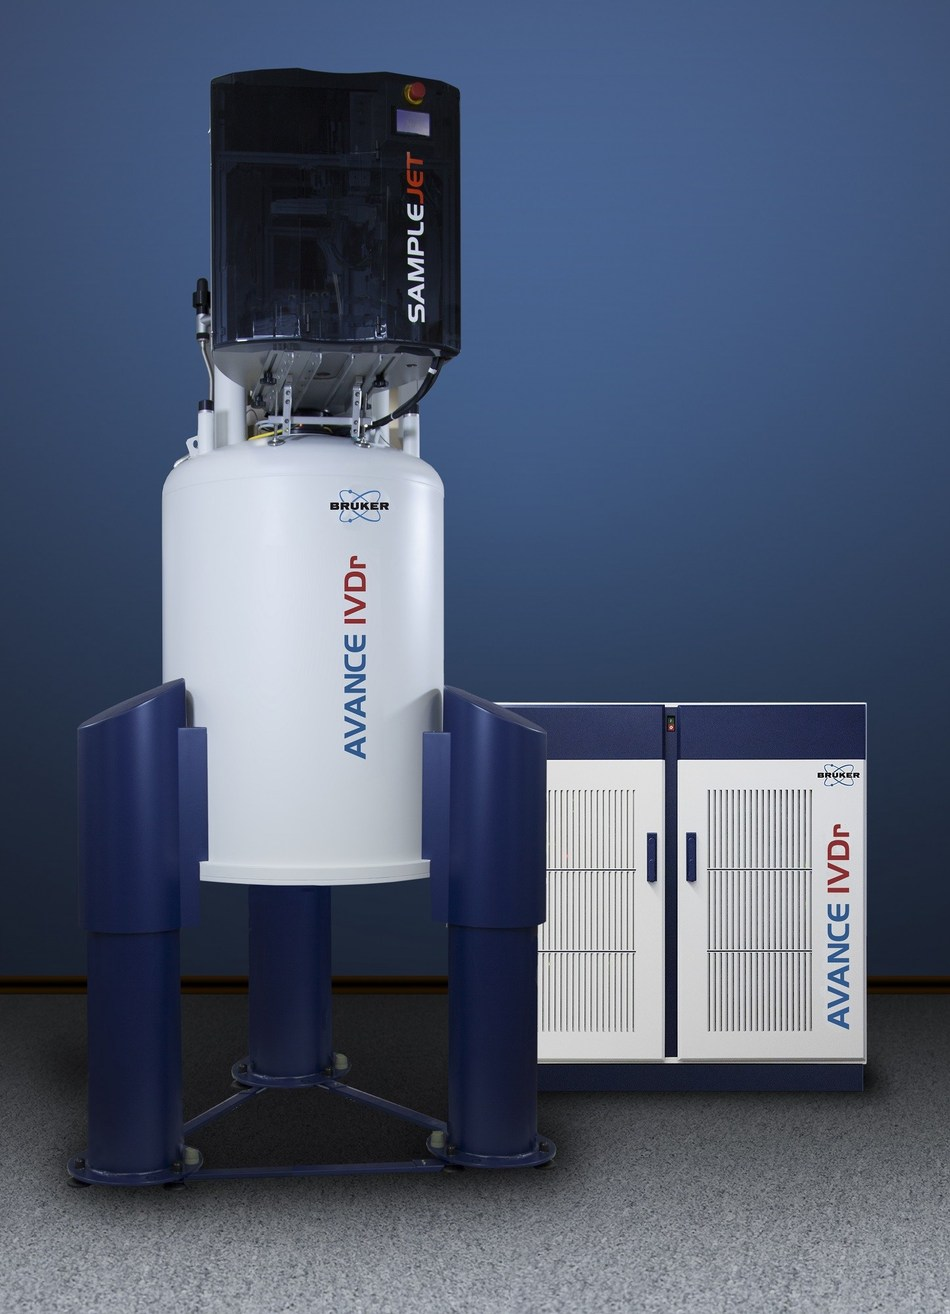 Avance IVDr - Bruker's NMR IVDr Platform for Translational Phenomics Research